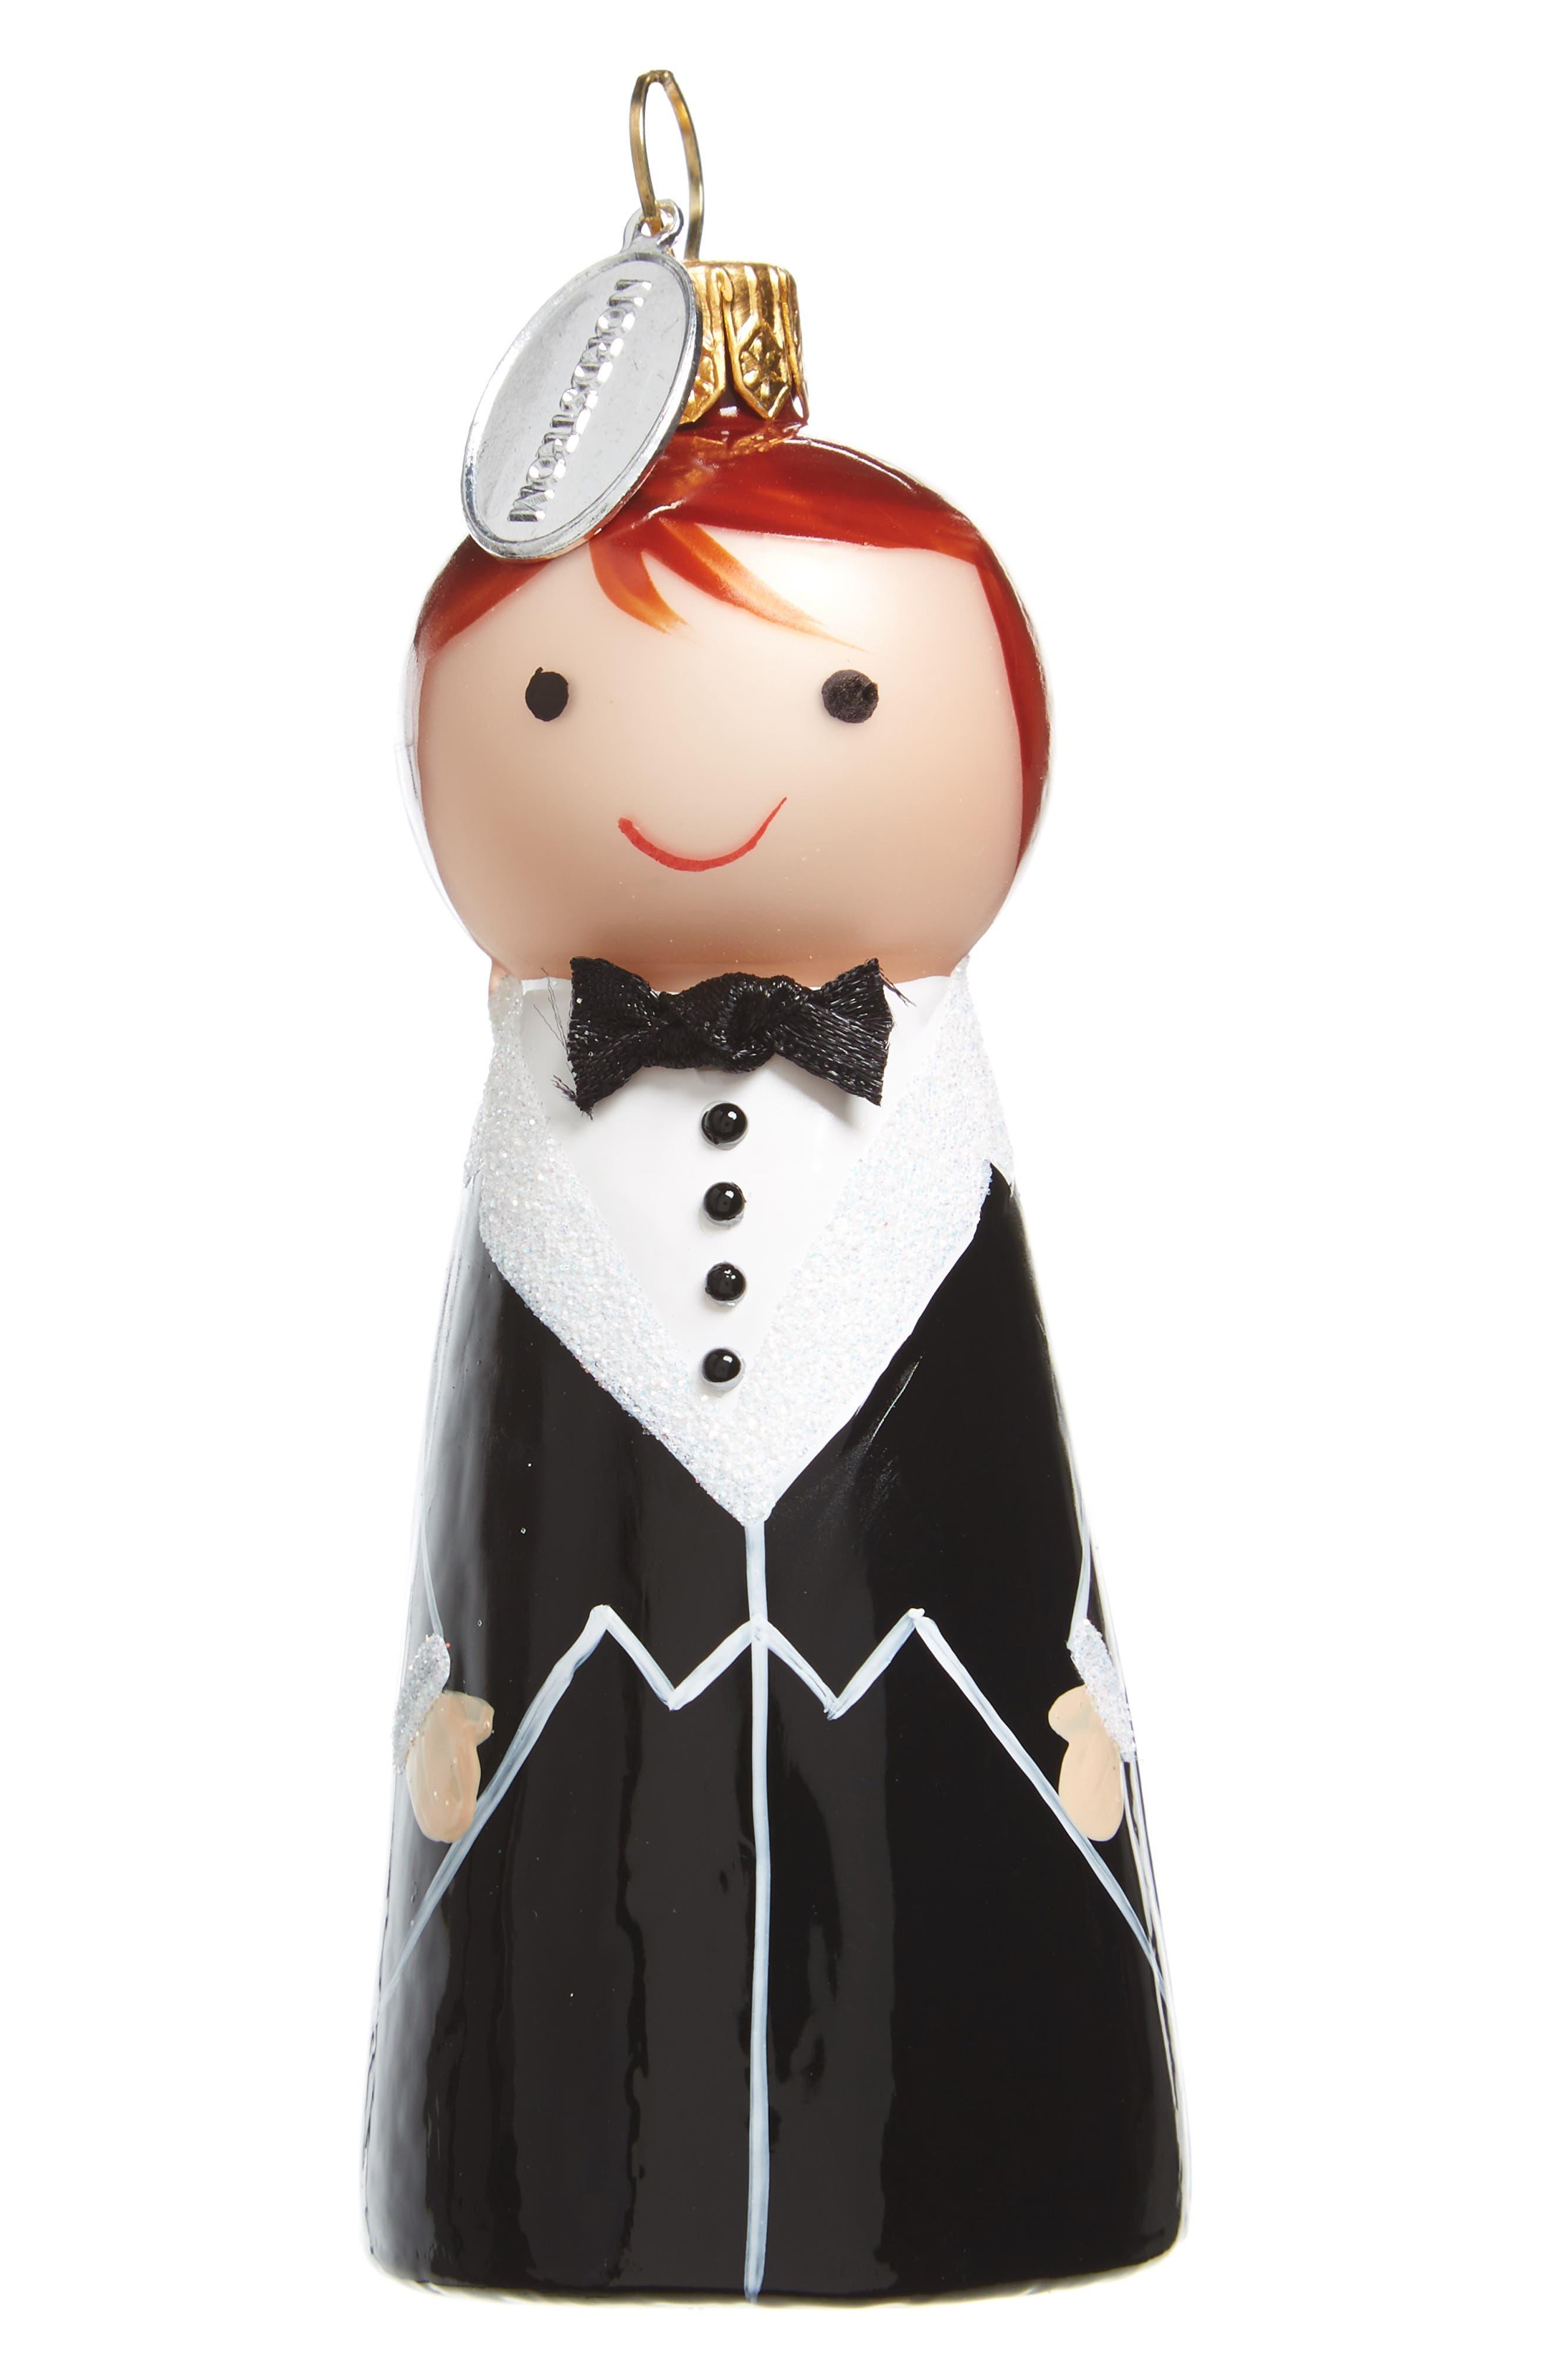 Nordstrom Glass Wedding Ornament,                         Main,                         color, Black Suit Groom